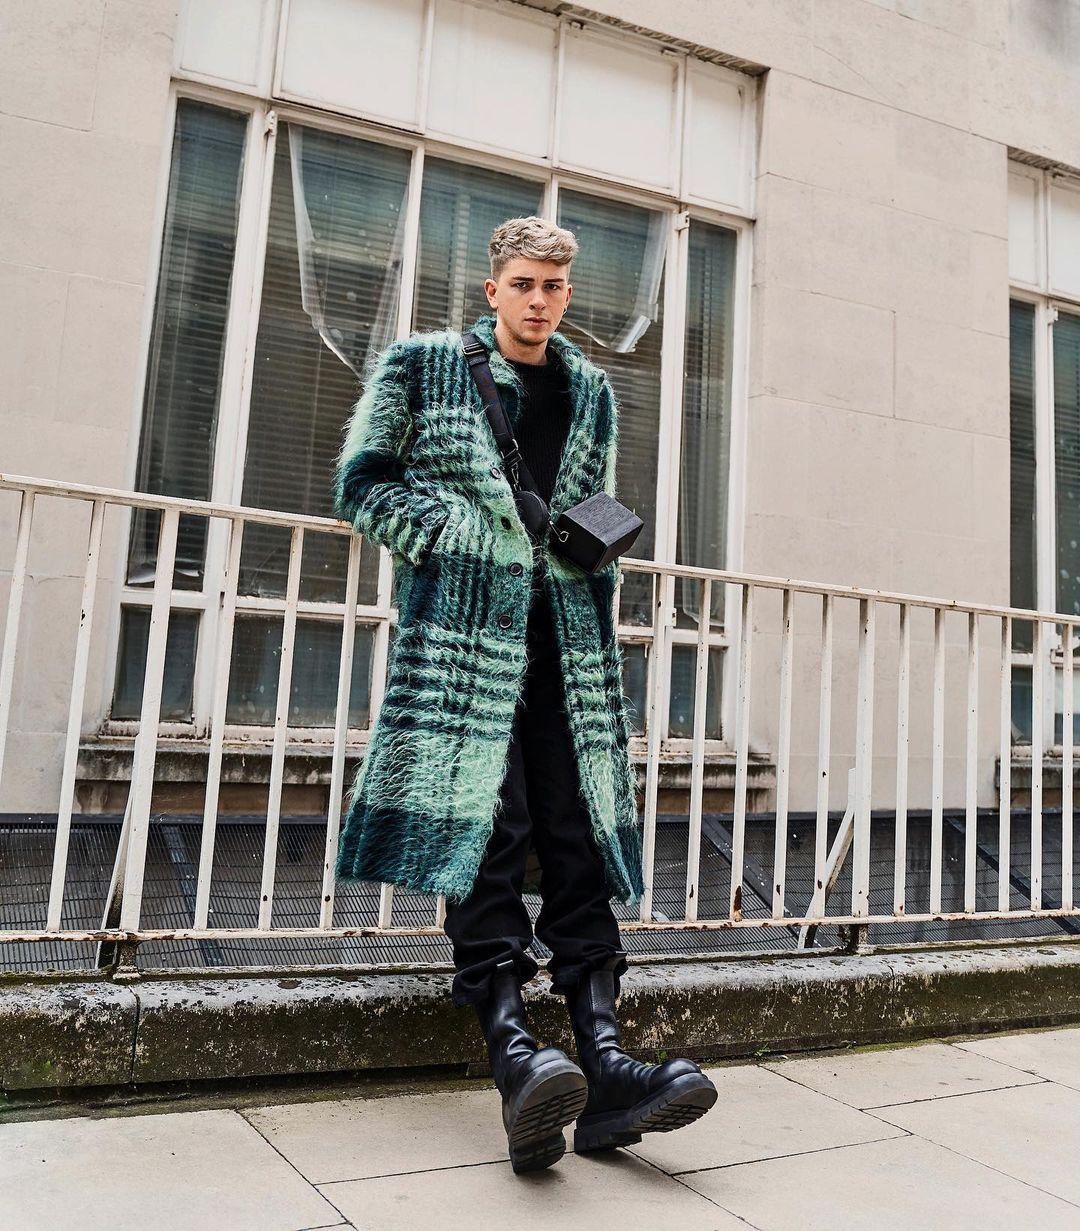 sao nam galluck mặc áo long coat xanh